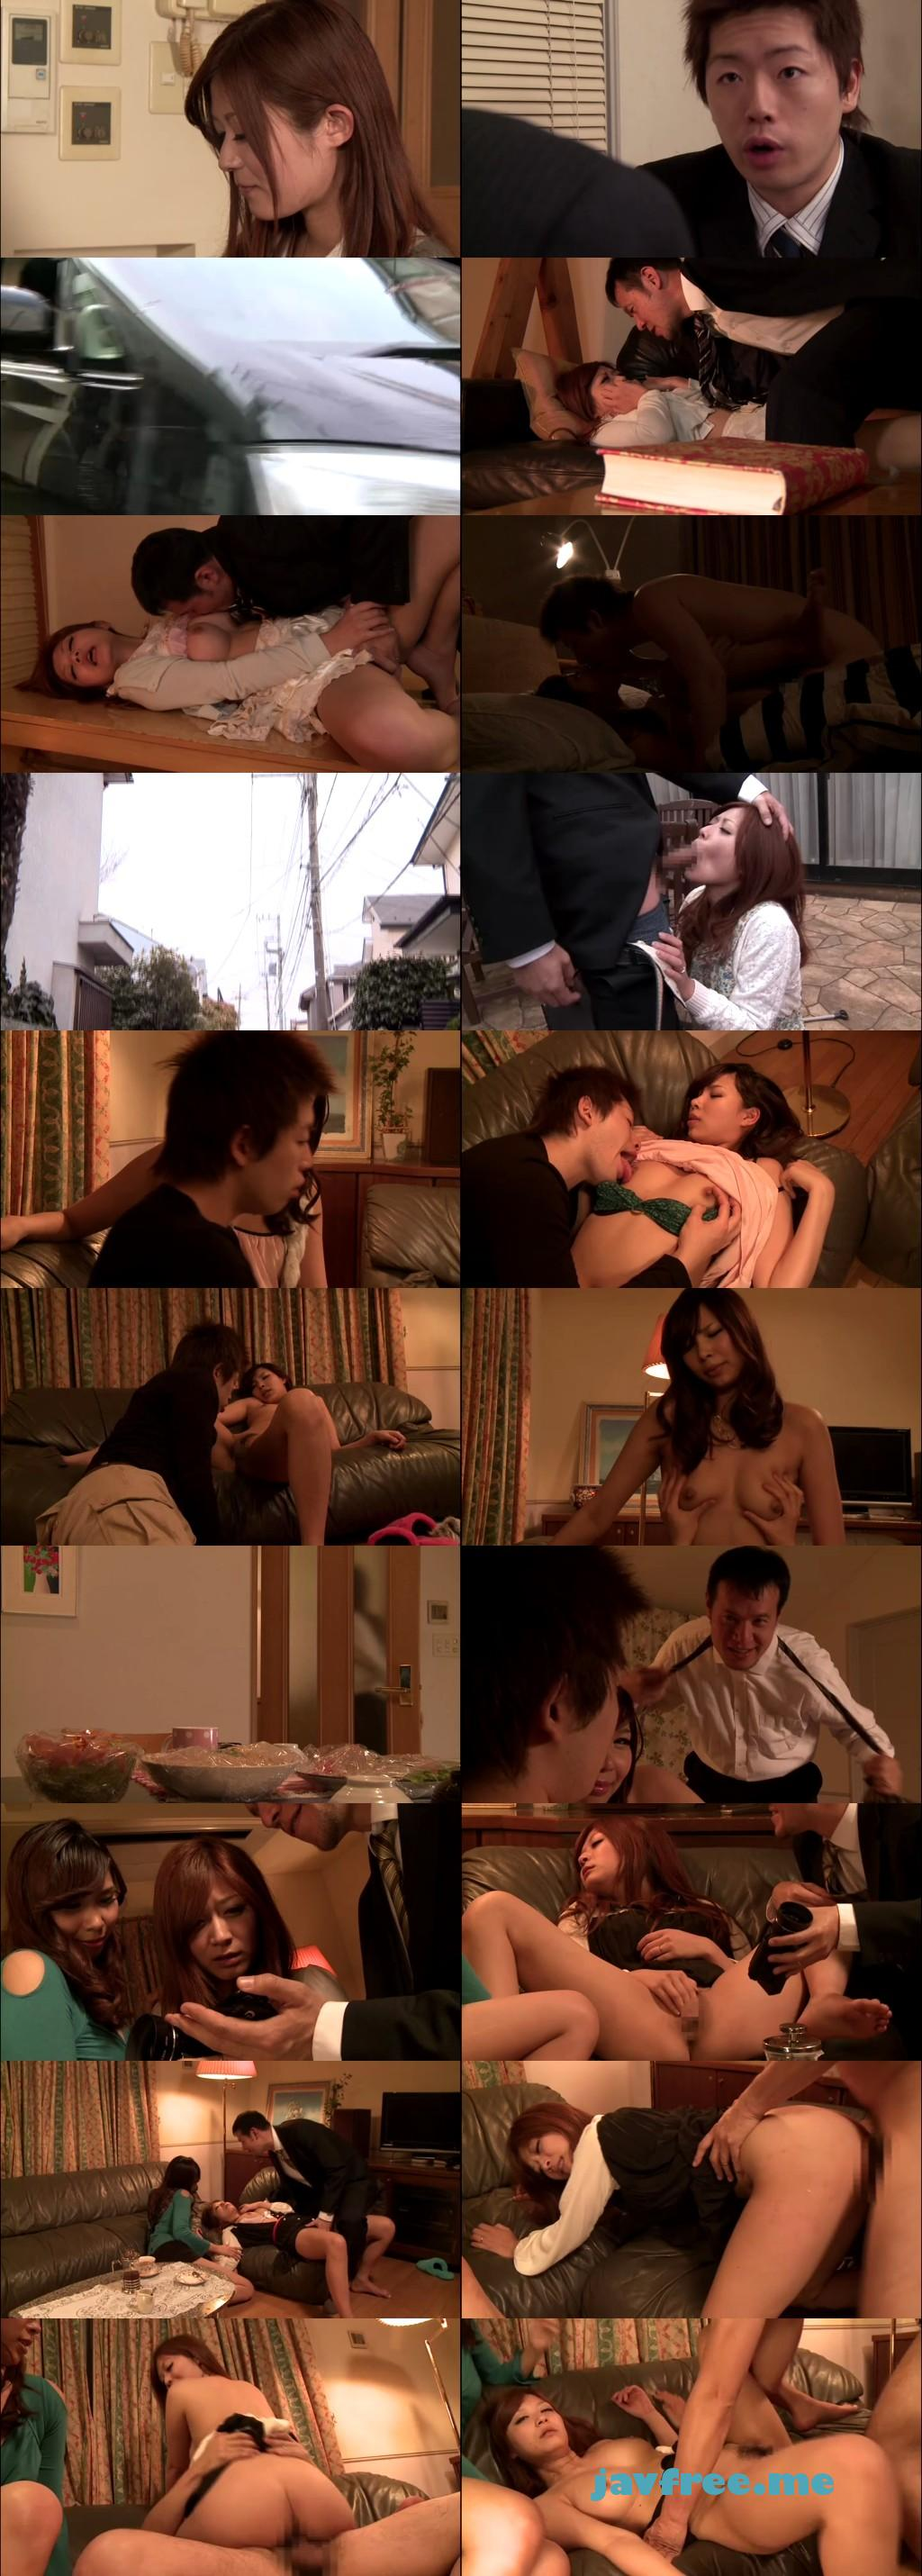 [TGA 013] 貞淑の限界 良妻は犯される度に潮噴射 さとう遥希 TGA